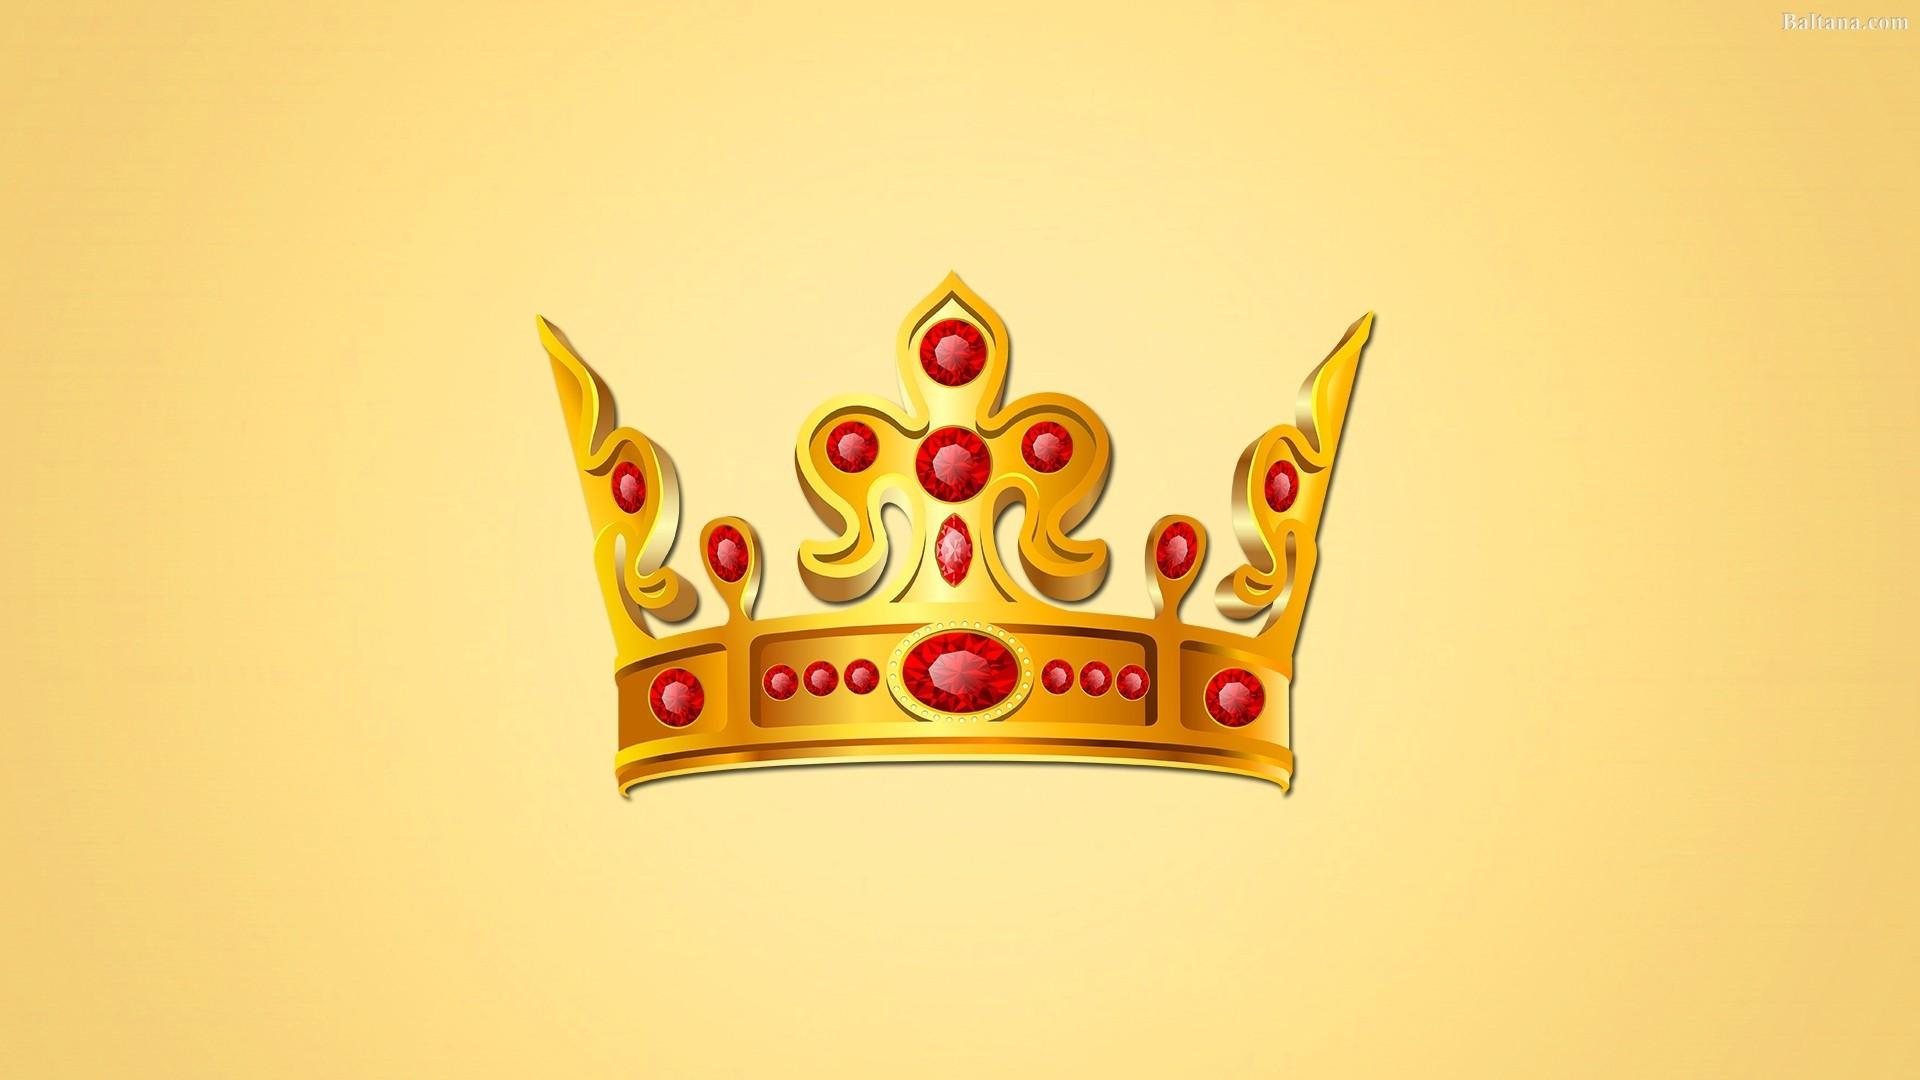 Crown hd desktop wallpaper